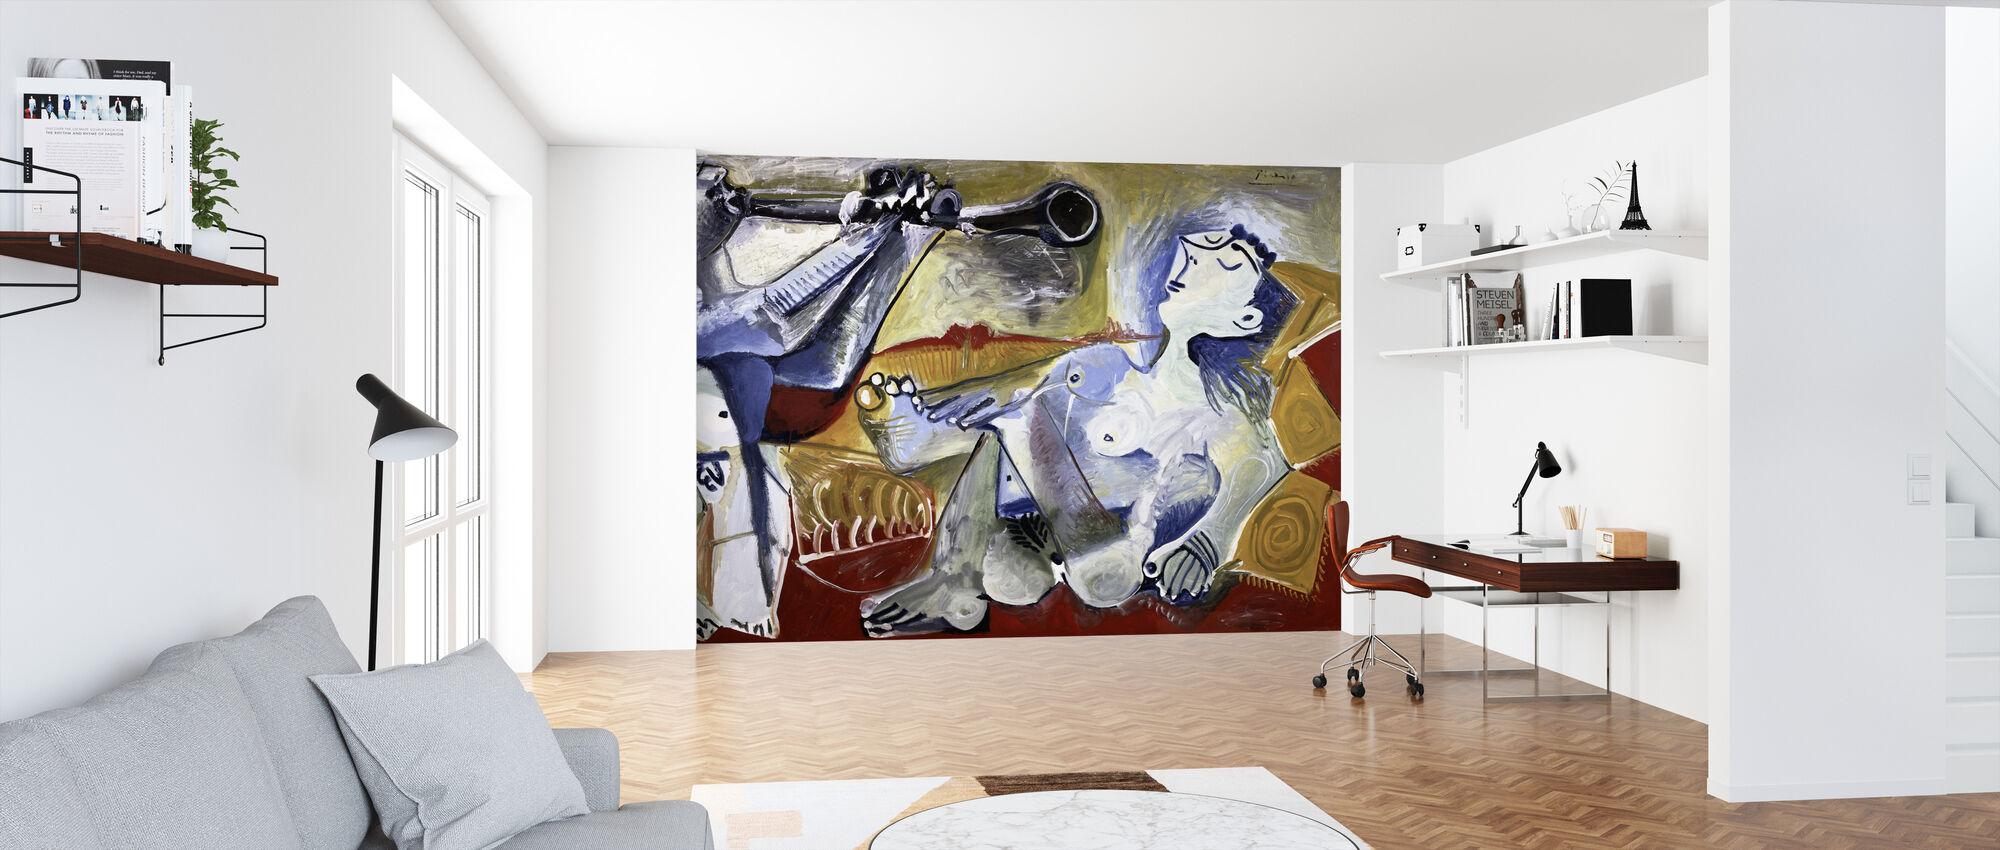 L Aubade - Pablo Picasso - Tapet - Kontor